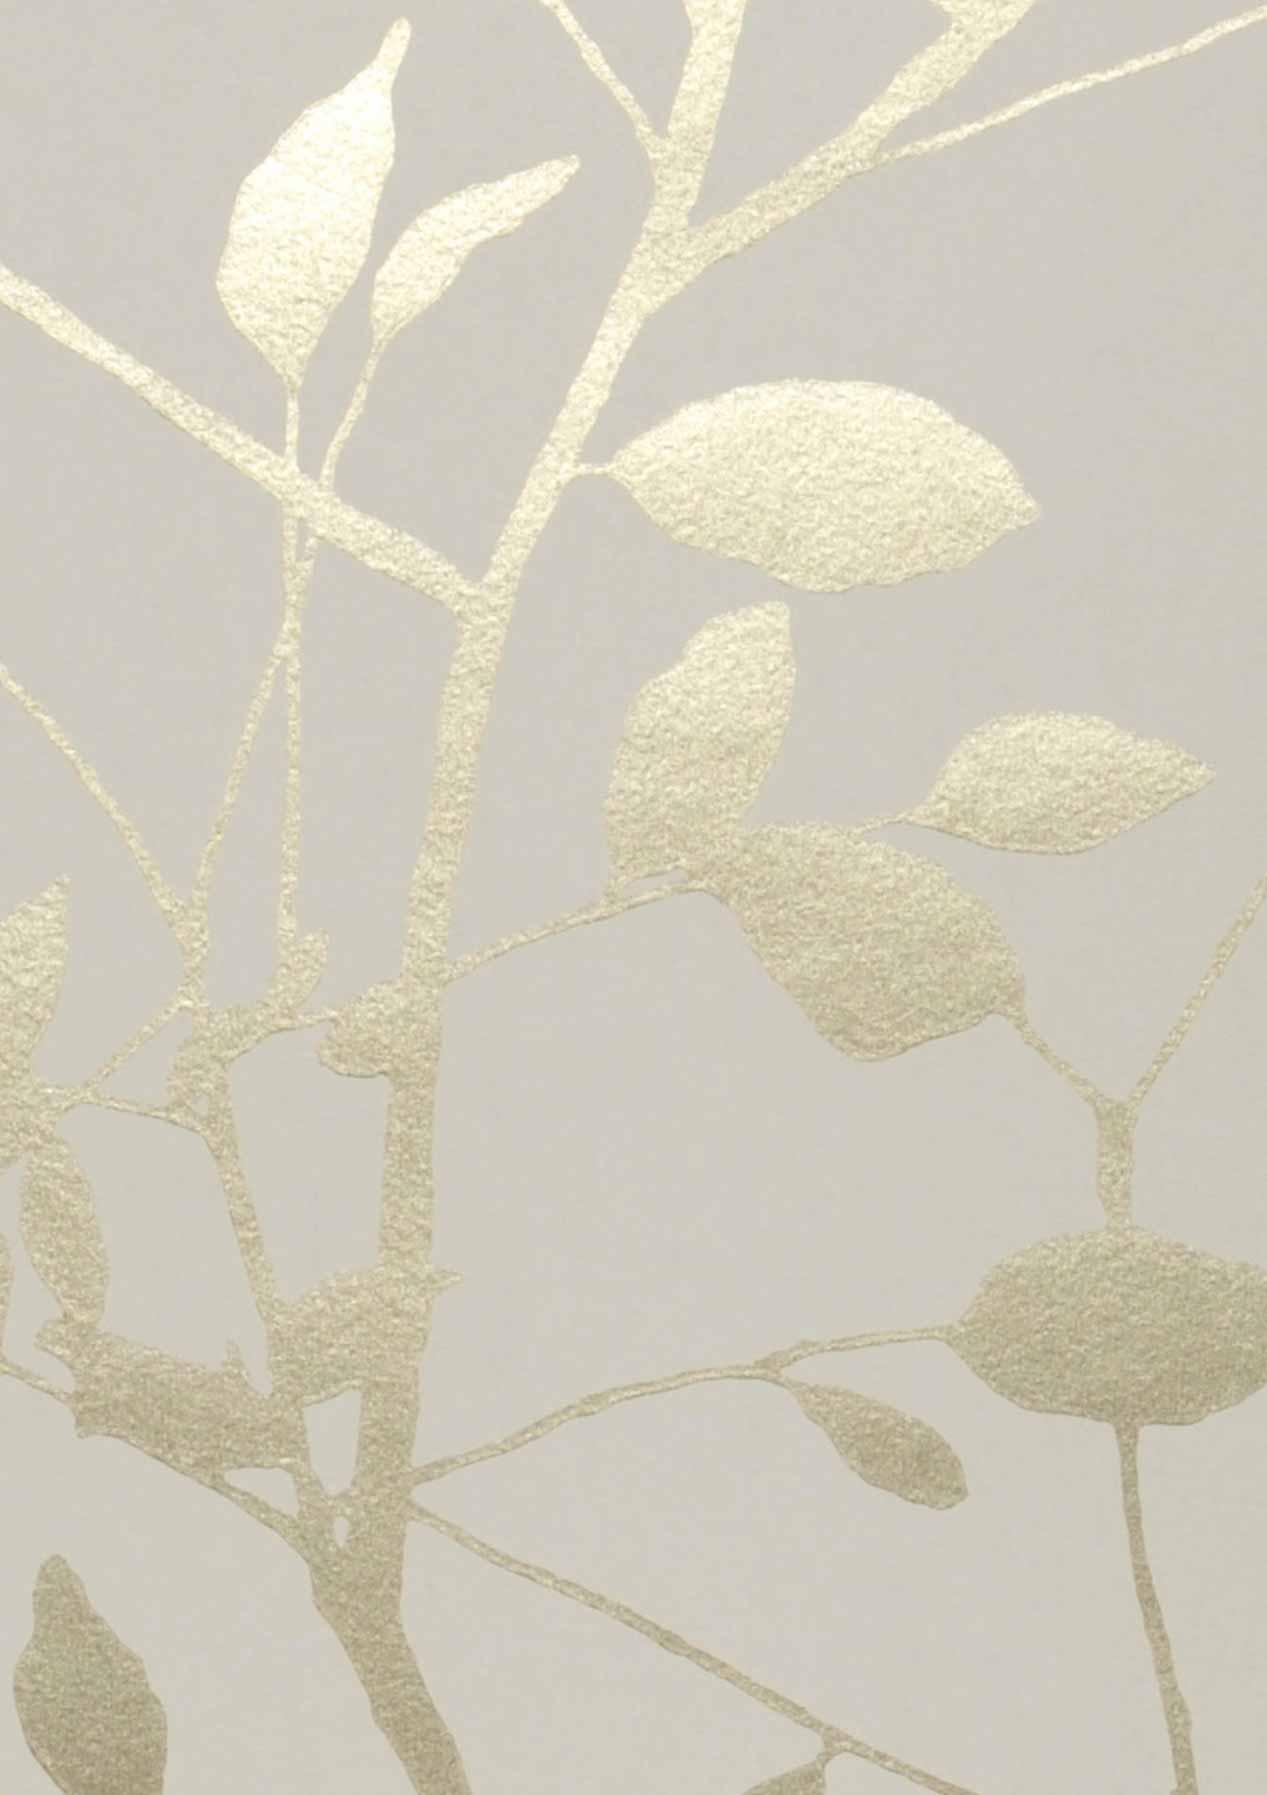 Tapete glorette grauweiss gold tapeten der 70er for Tapete nach hause